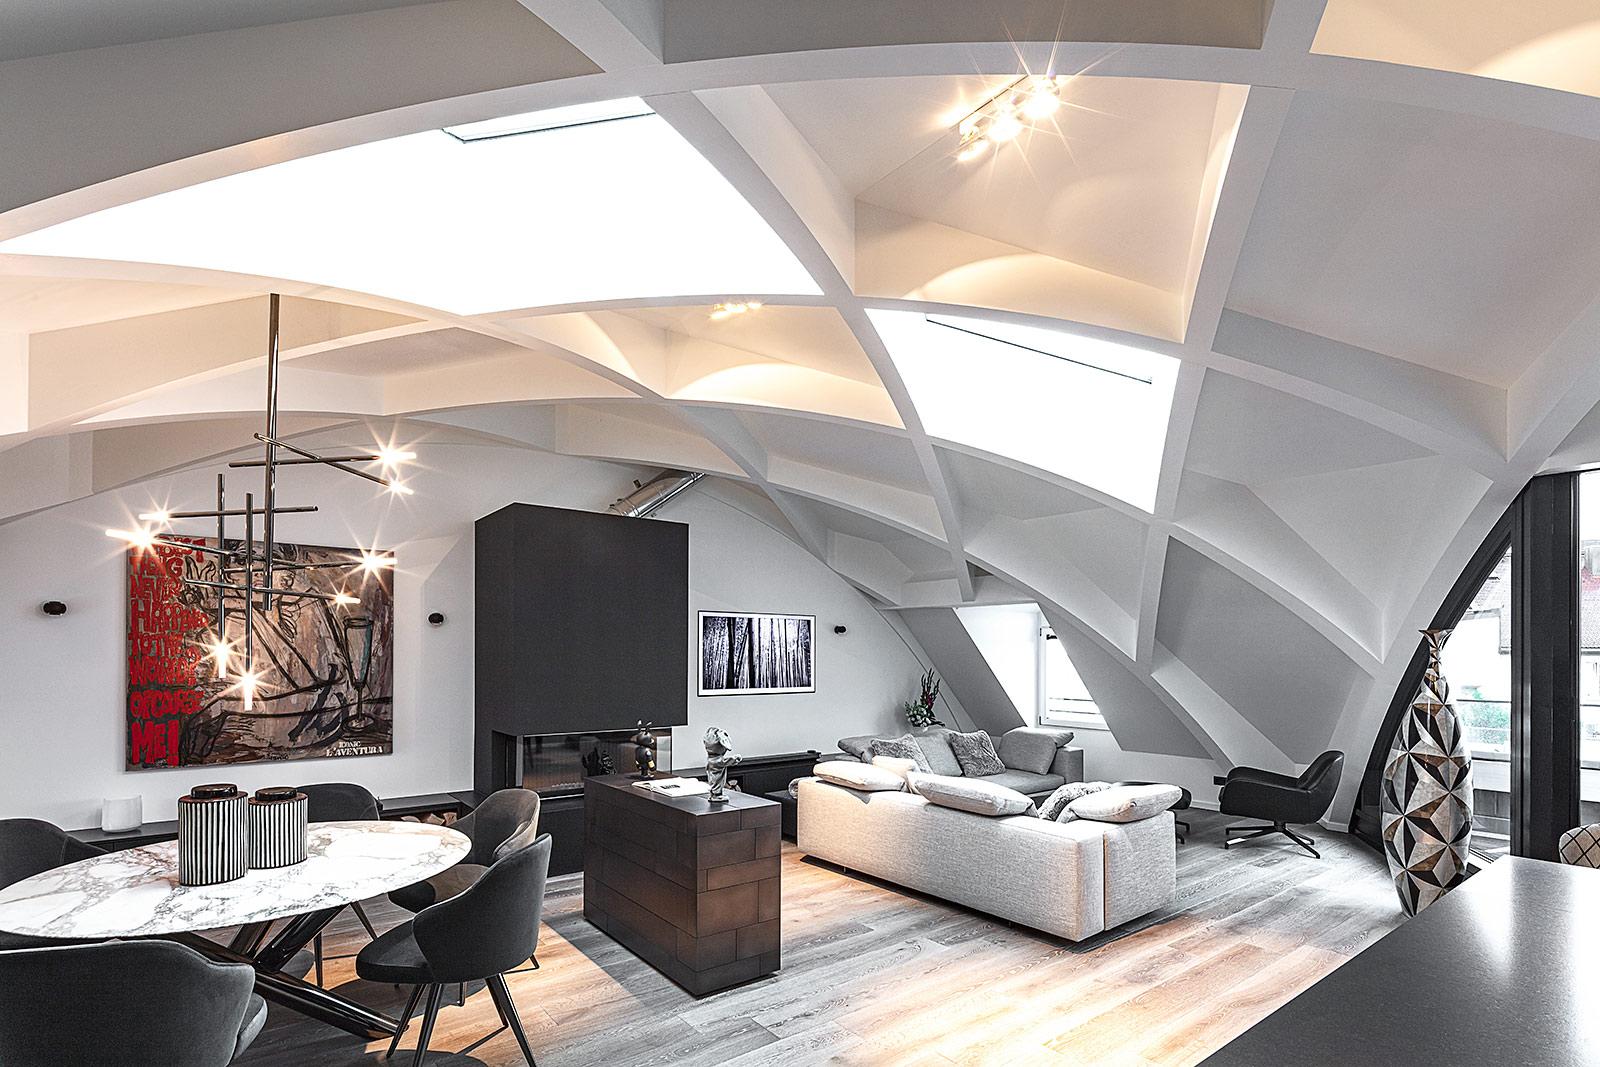 Interiorfotografie Dachgeschoss Wohnung